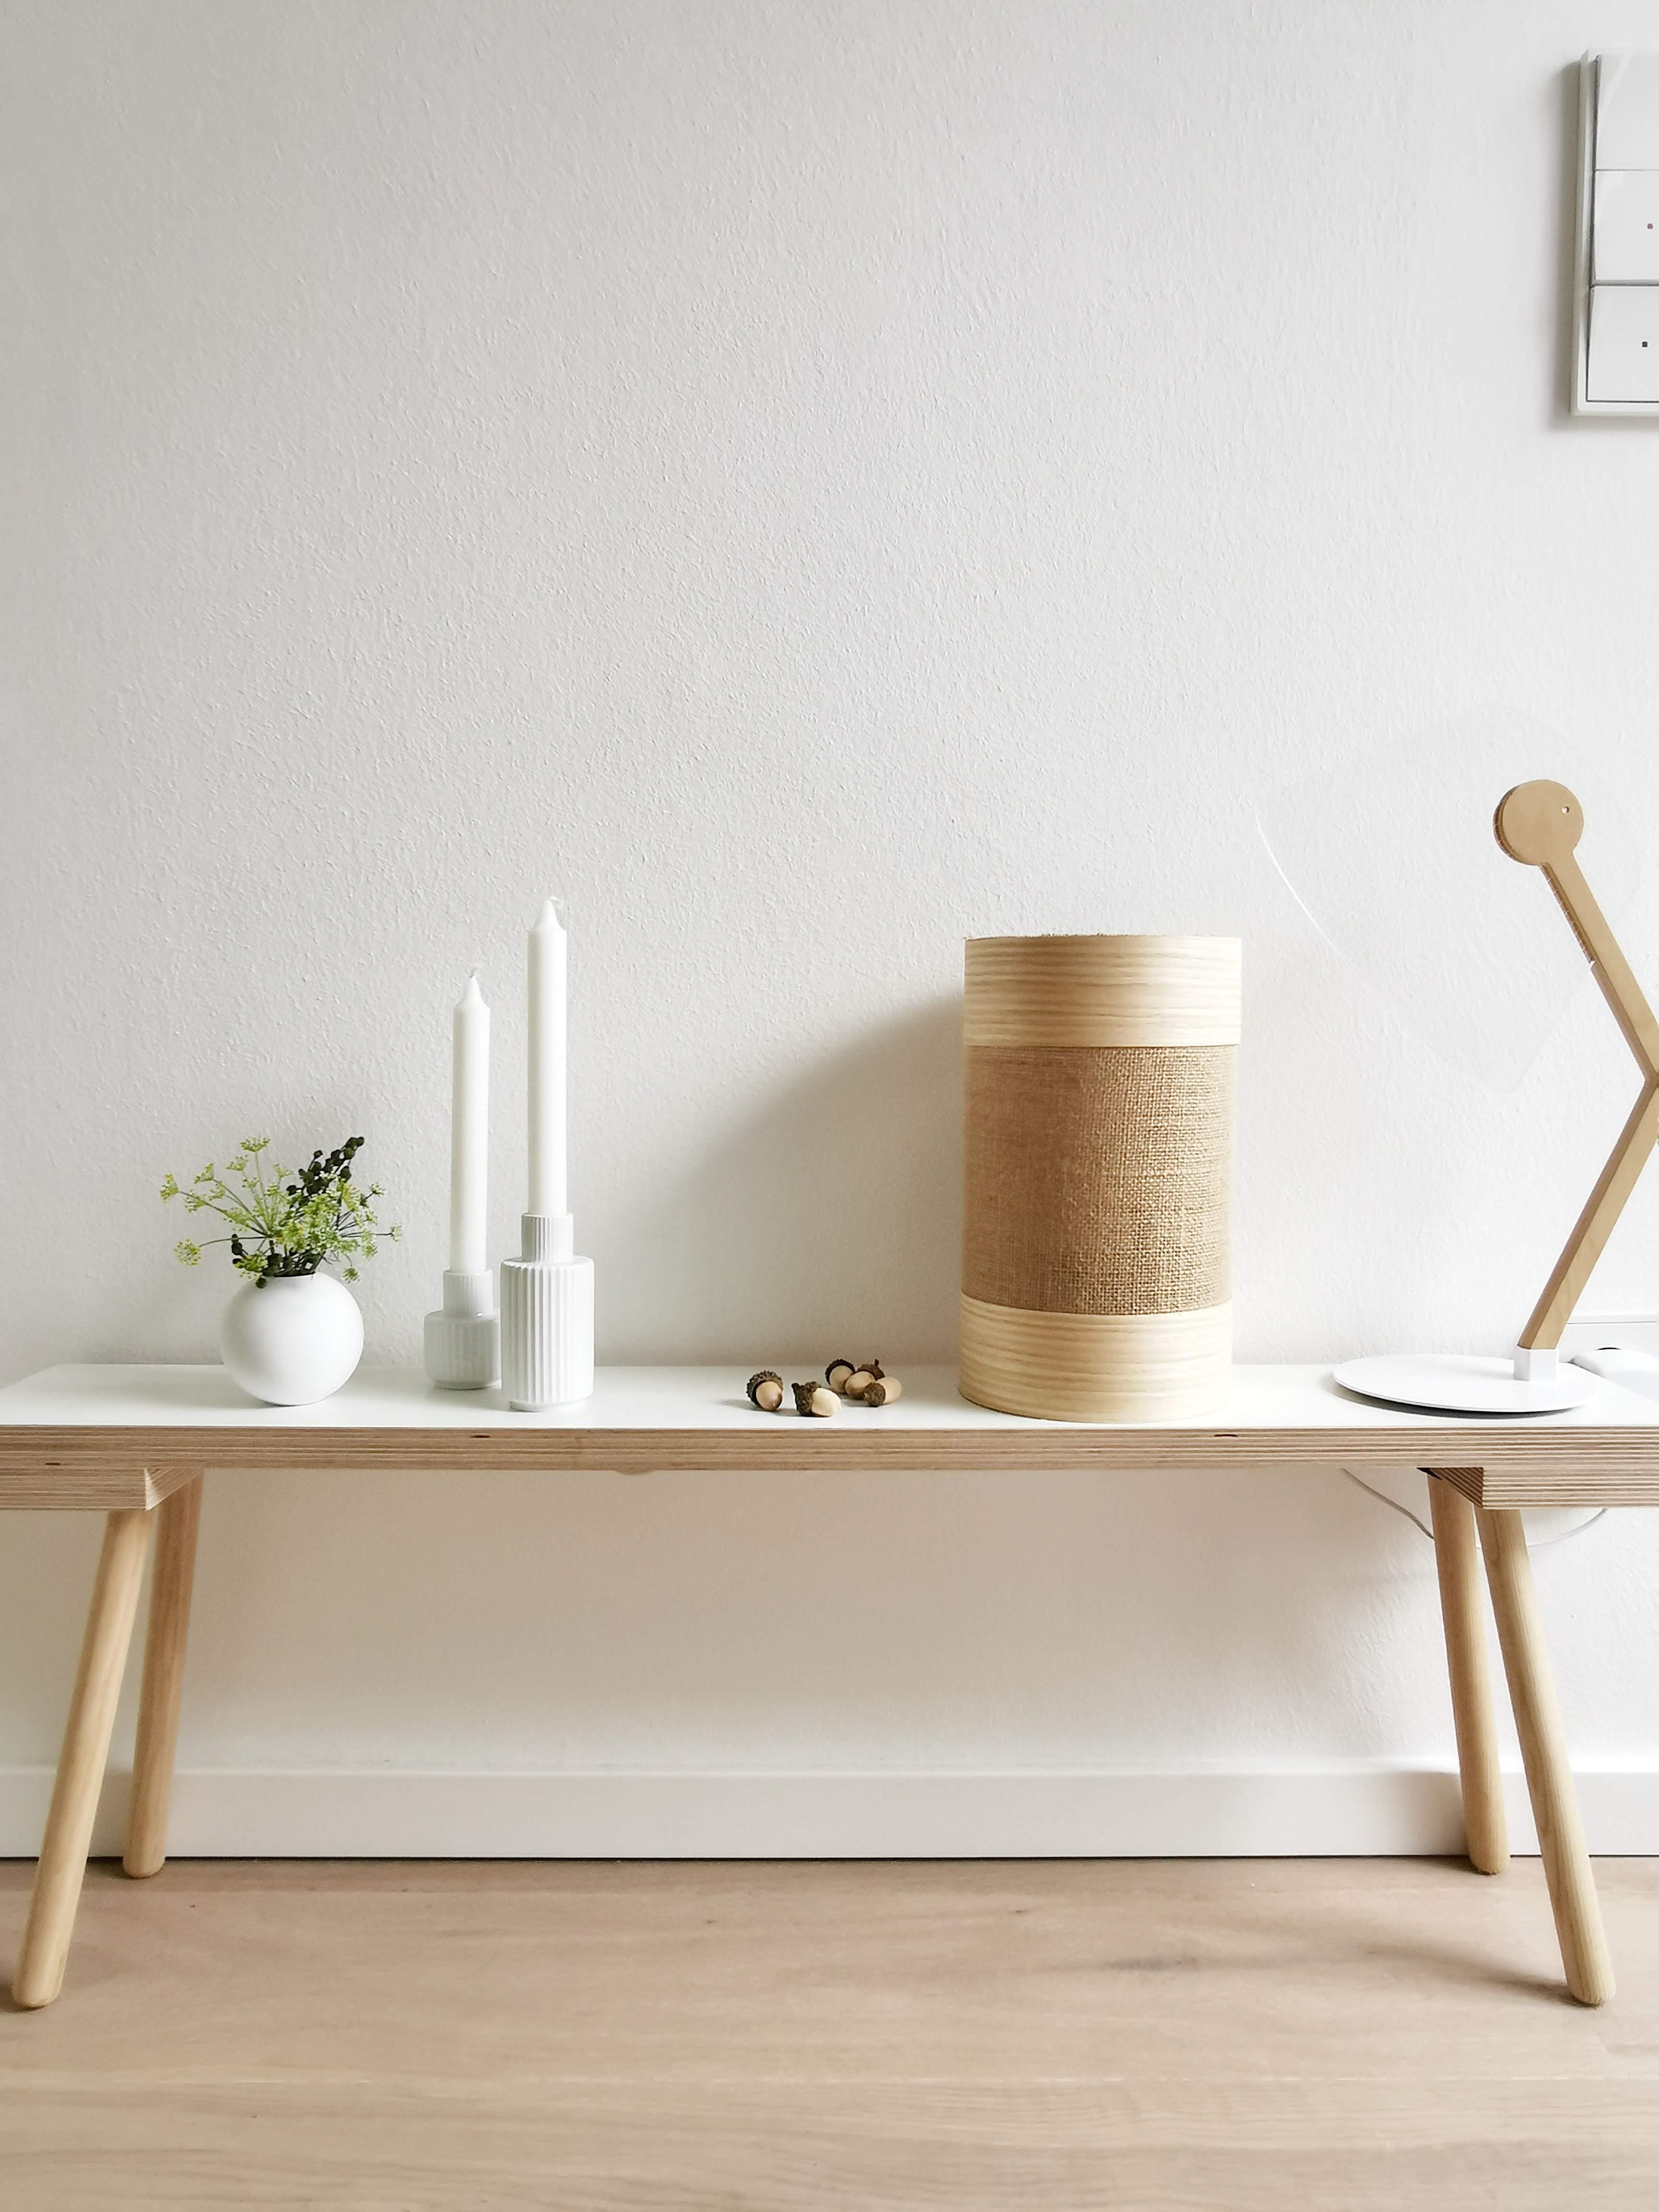 DIY Laternen aus Leinen, Jute und Furnierholz smart beleuchtet | mammilade.com